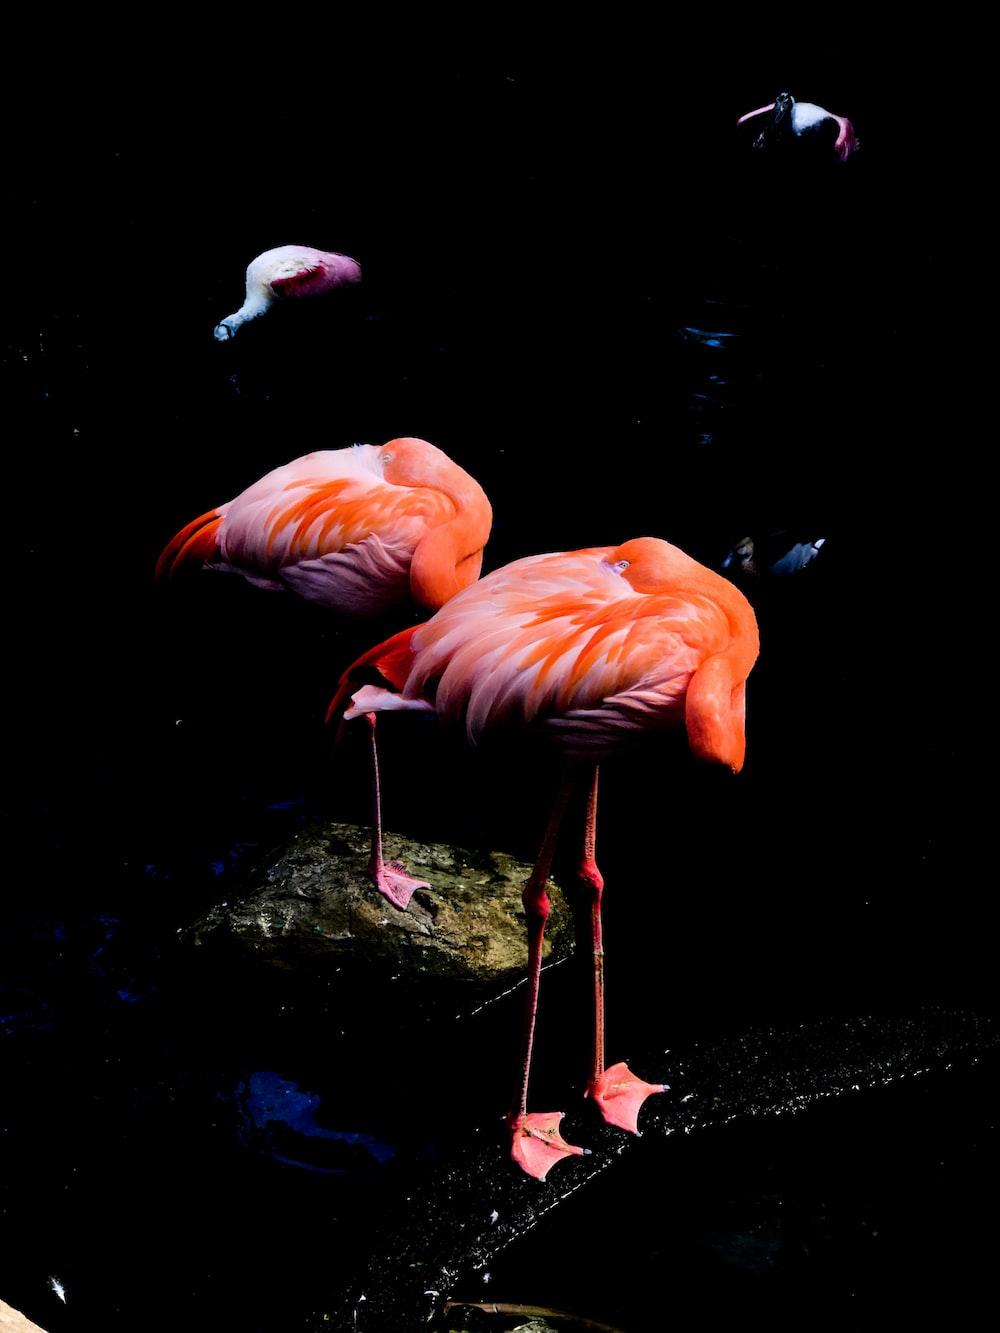 low-light photo of two orange flamingos